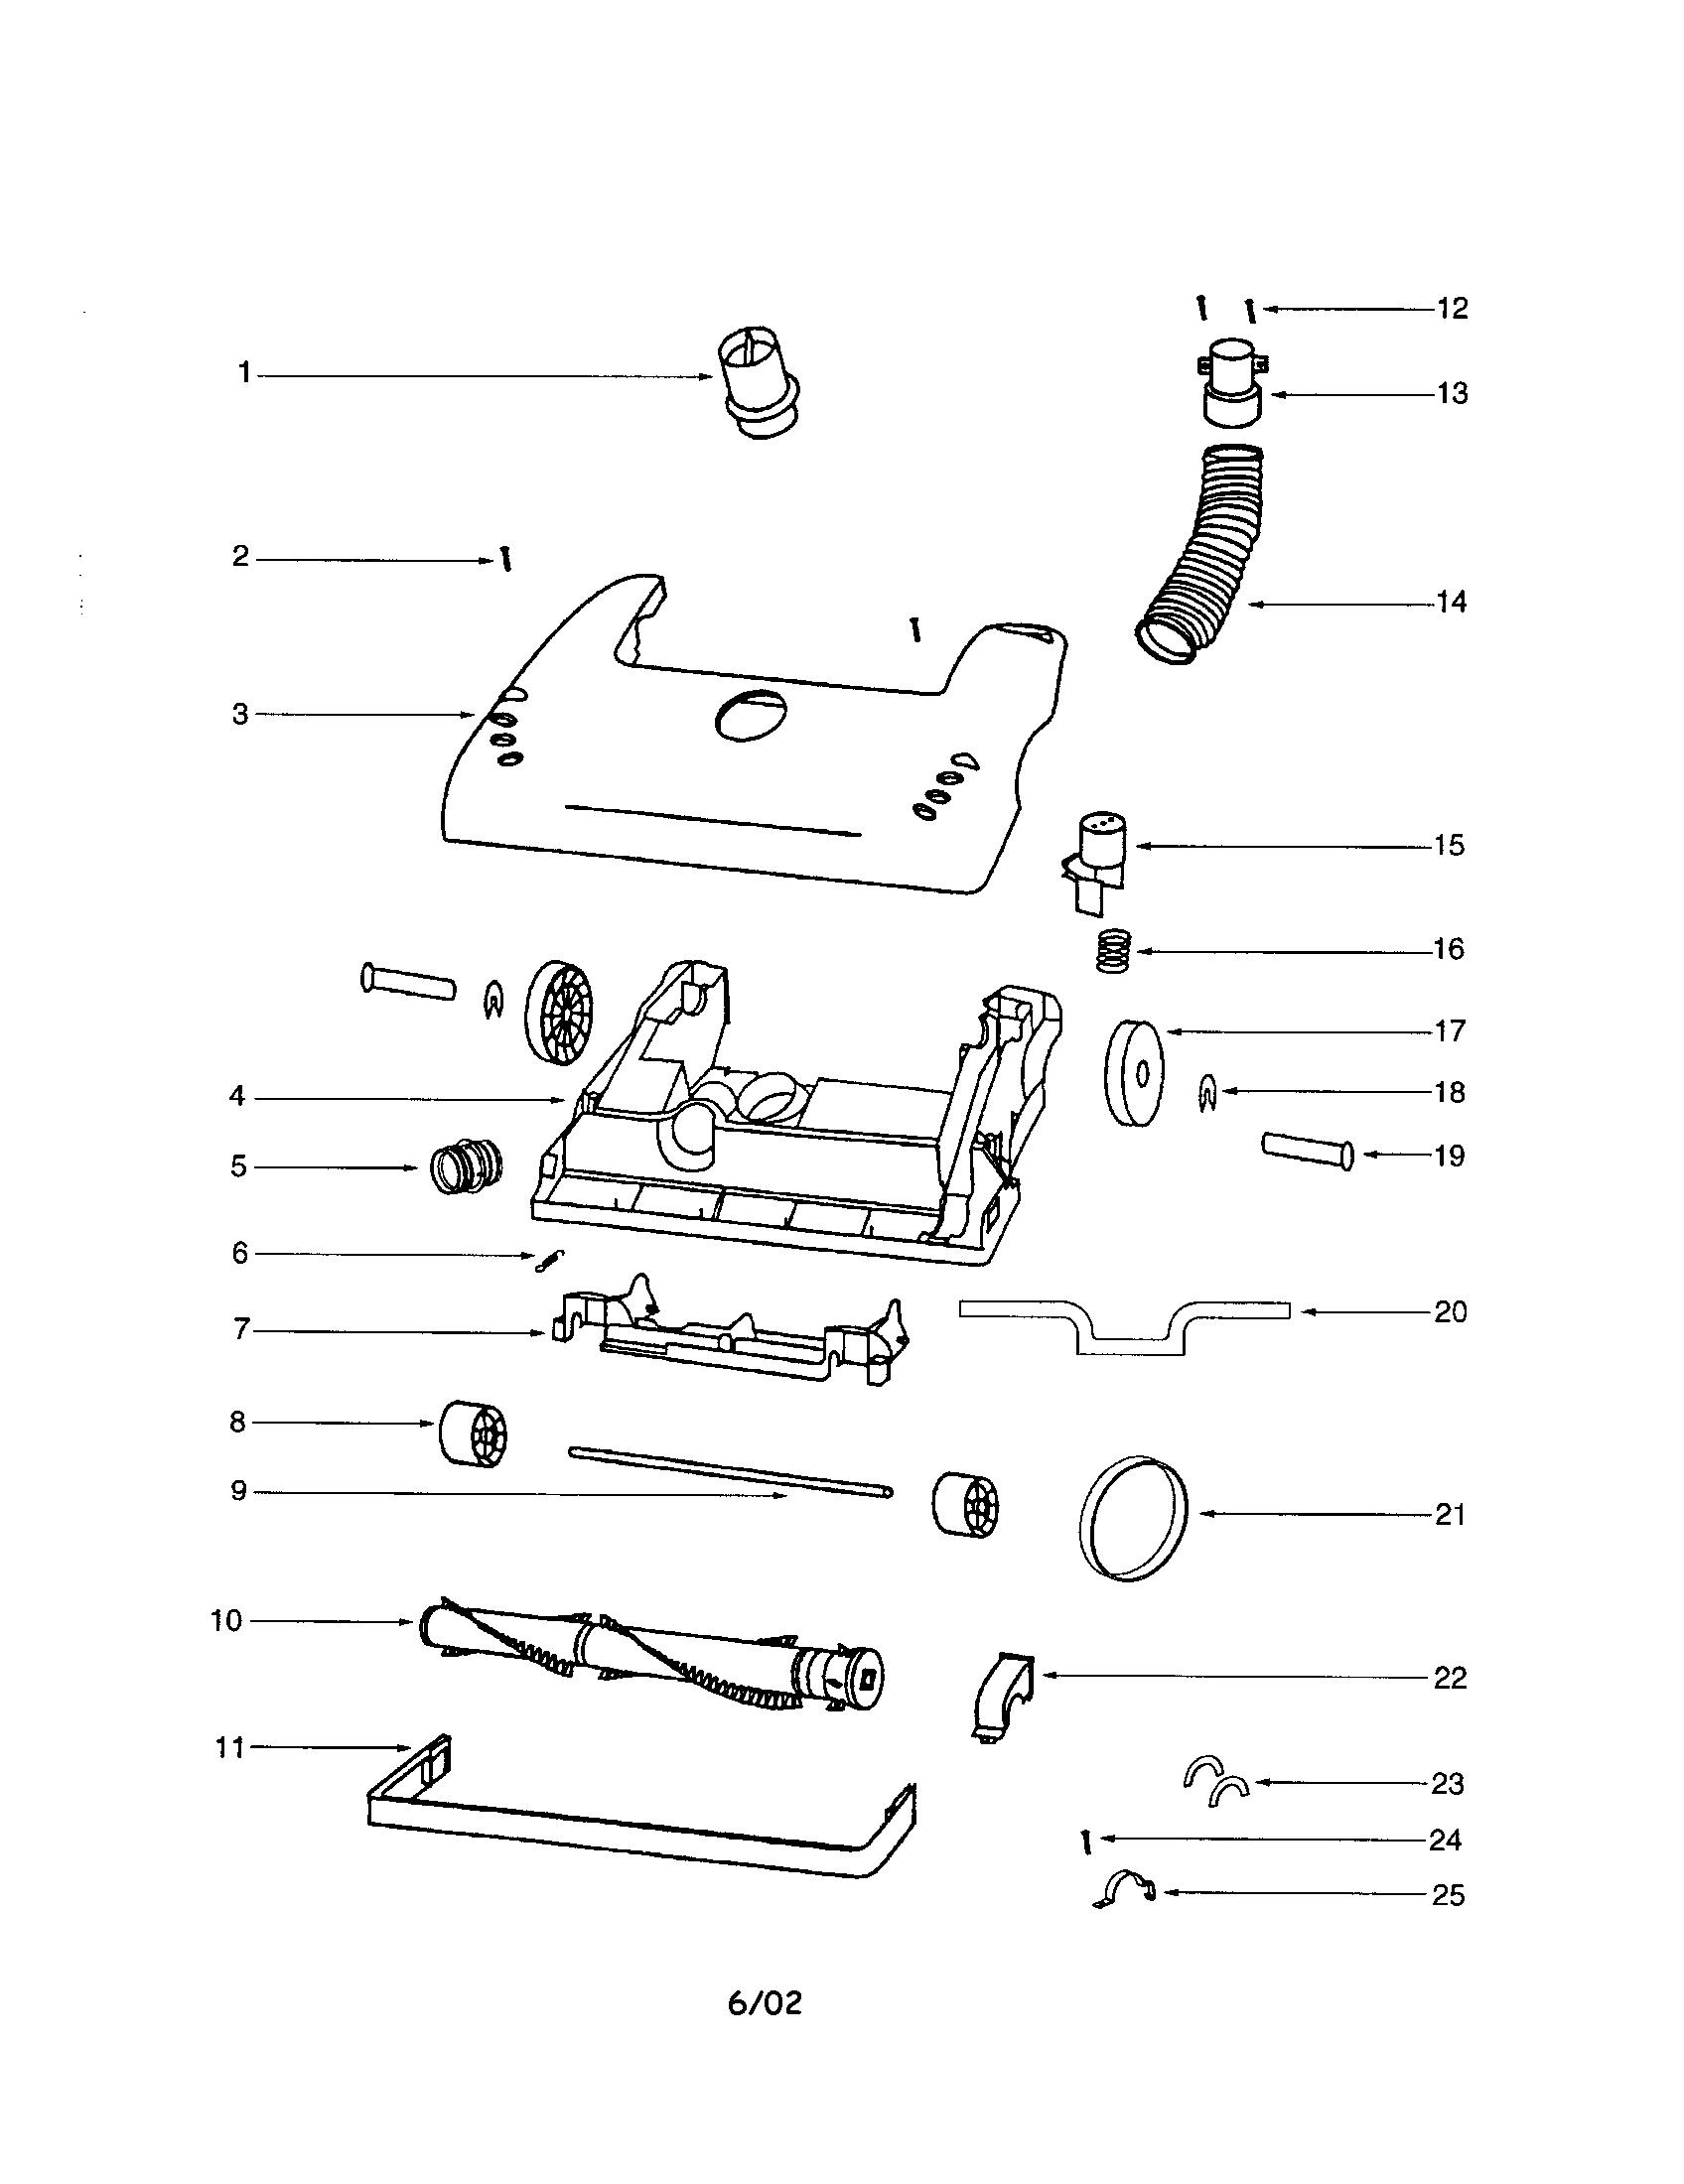 Eureka model 4467AV vacuum, upright genuine parts